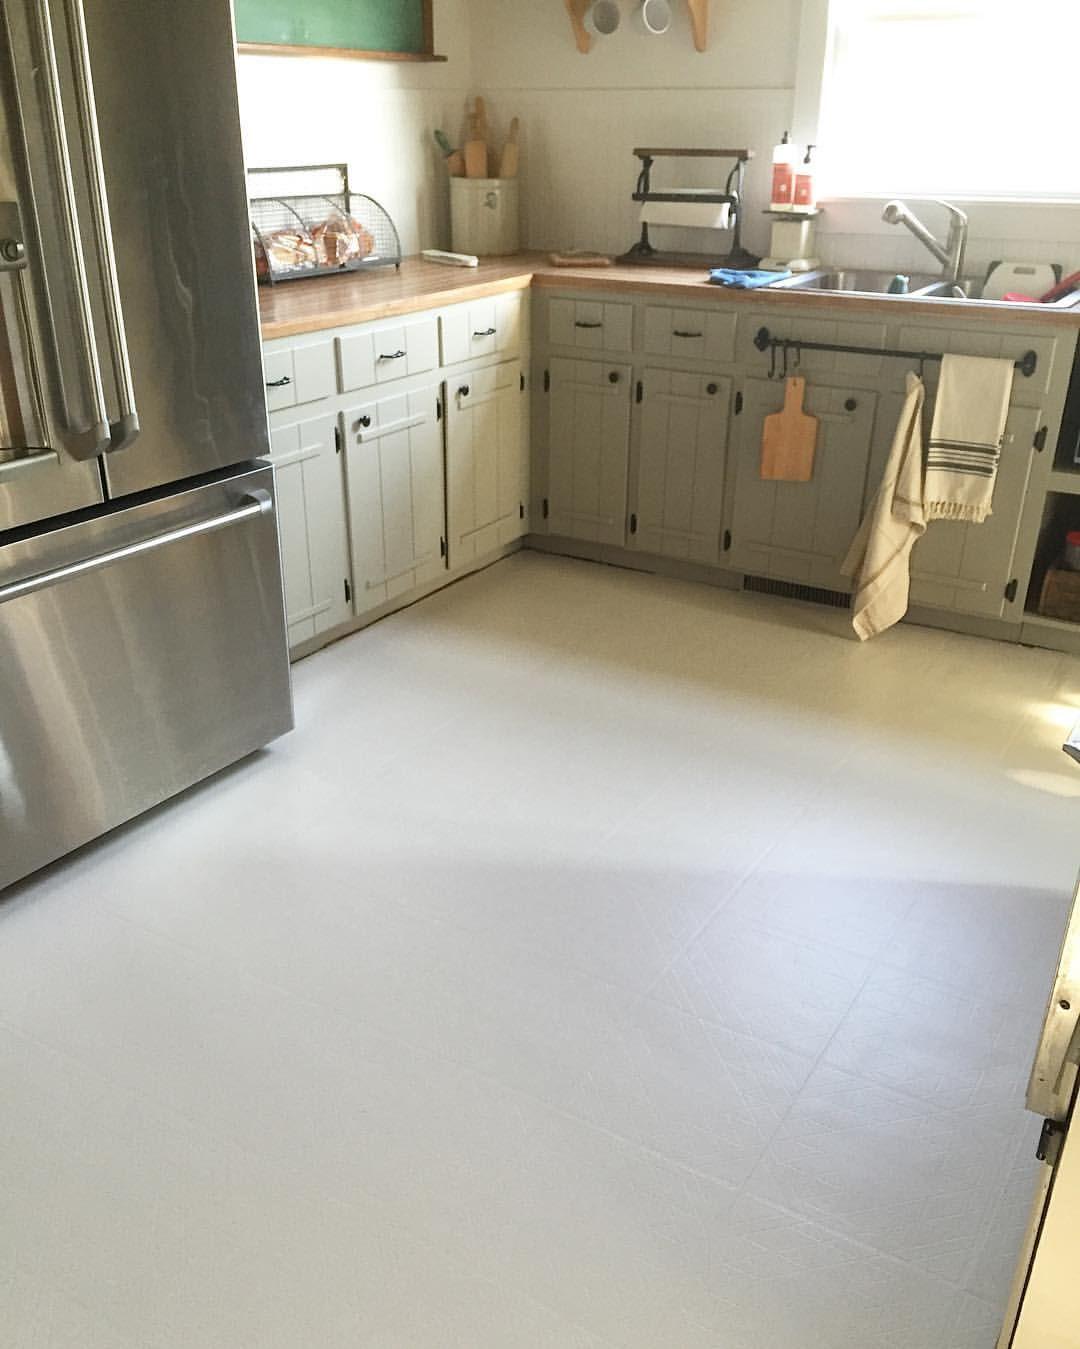 Painted Linoleum Floors!